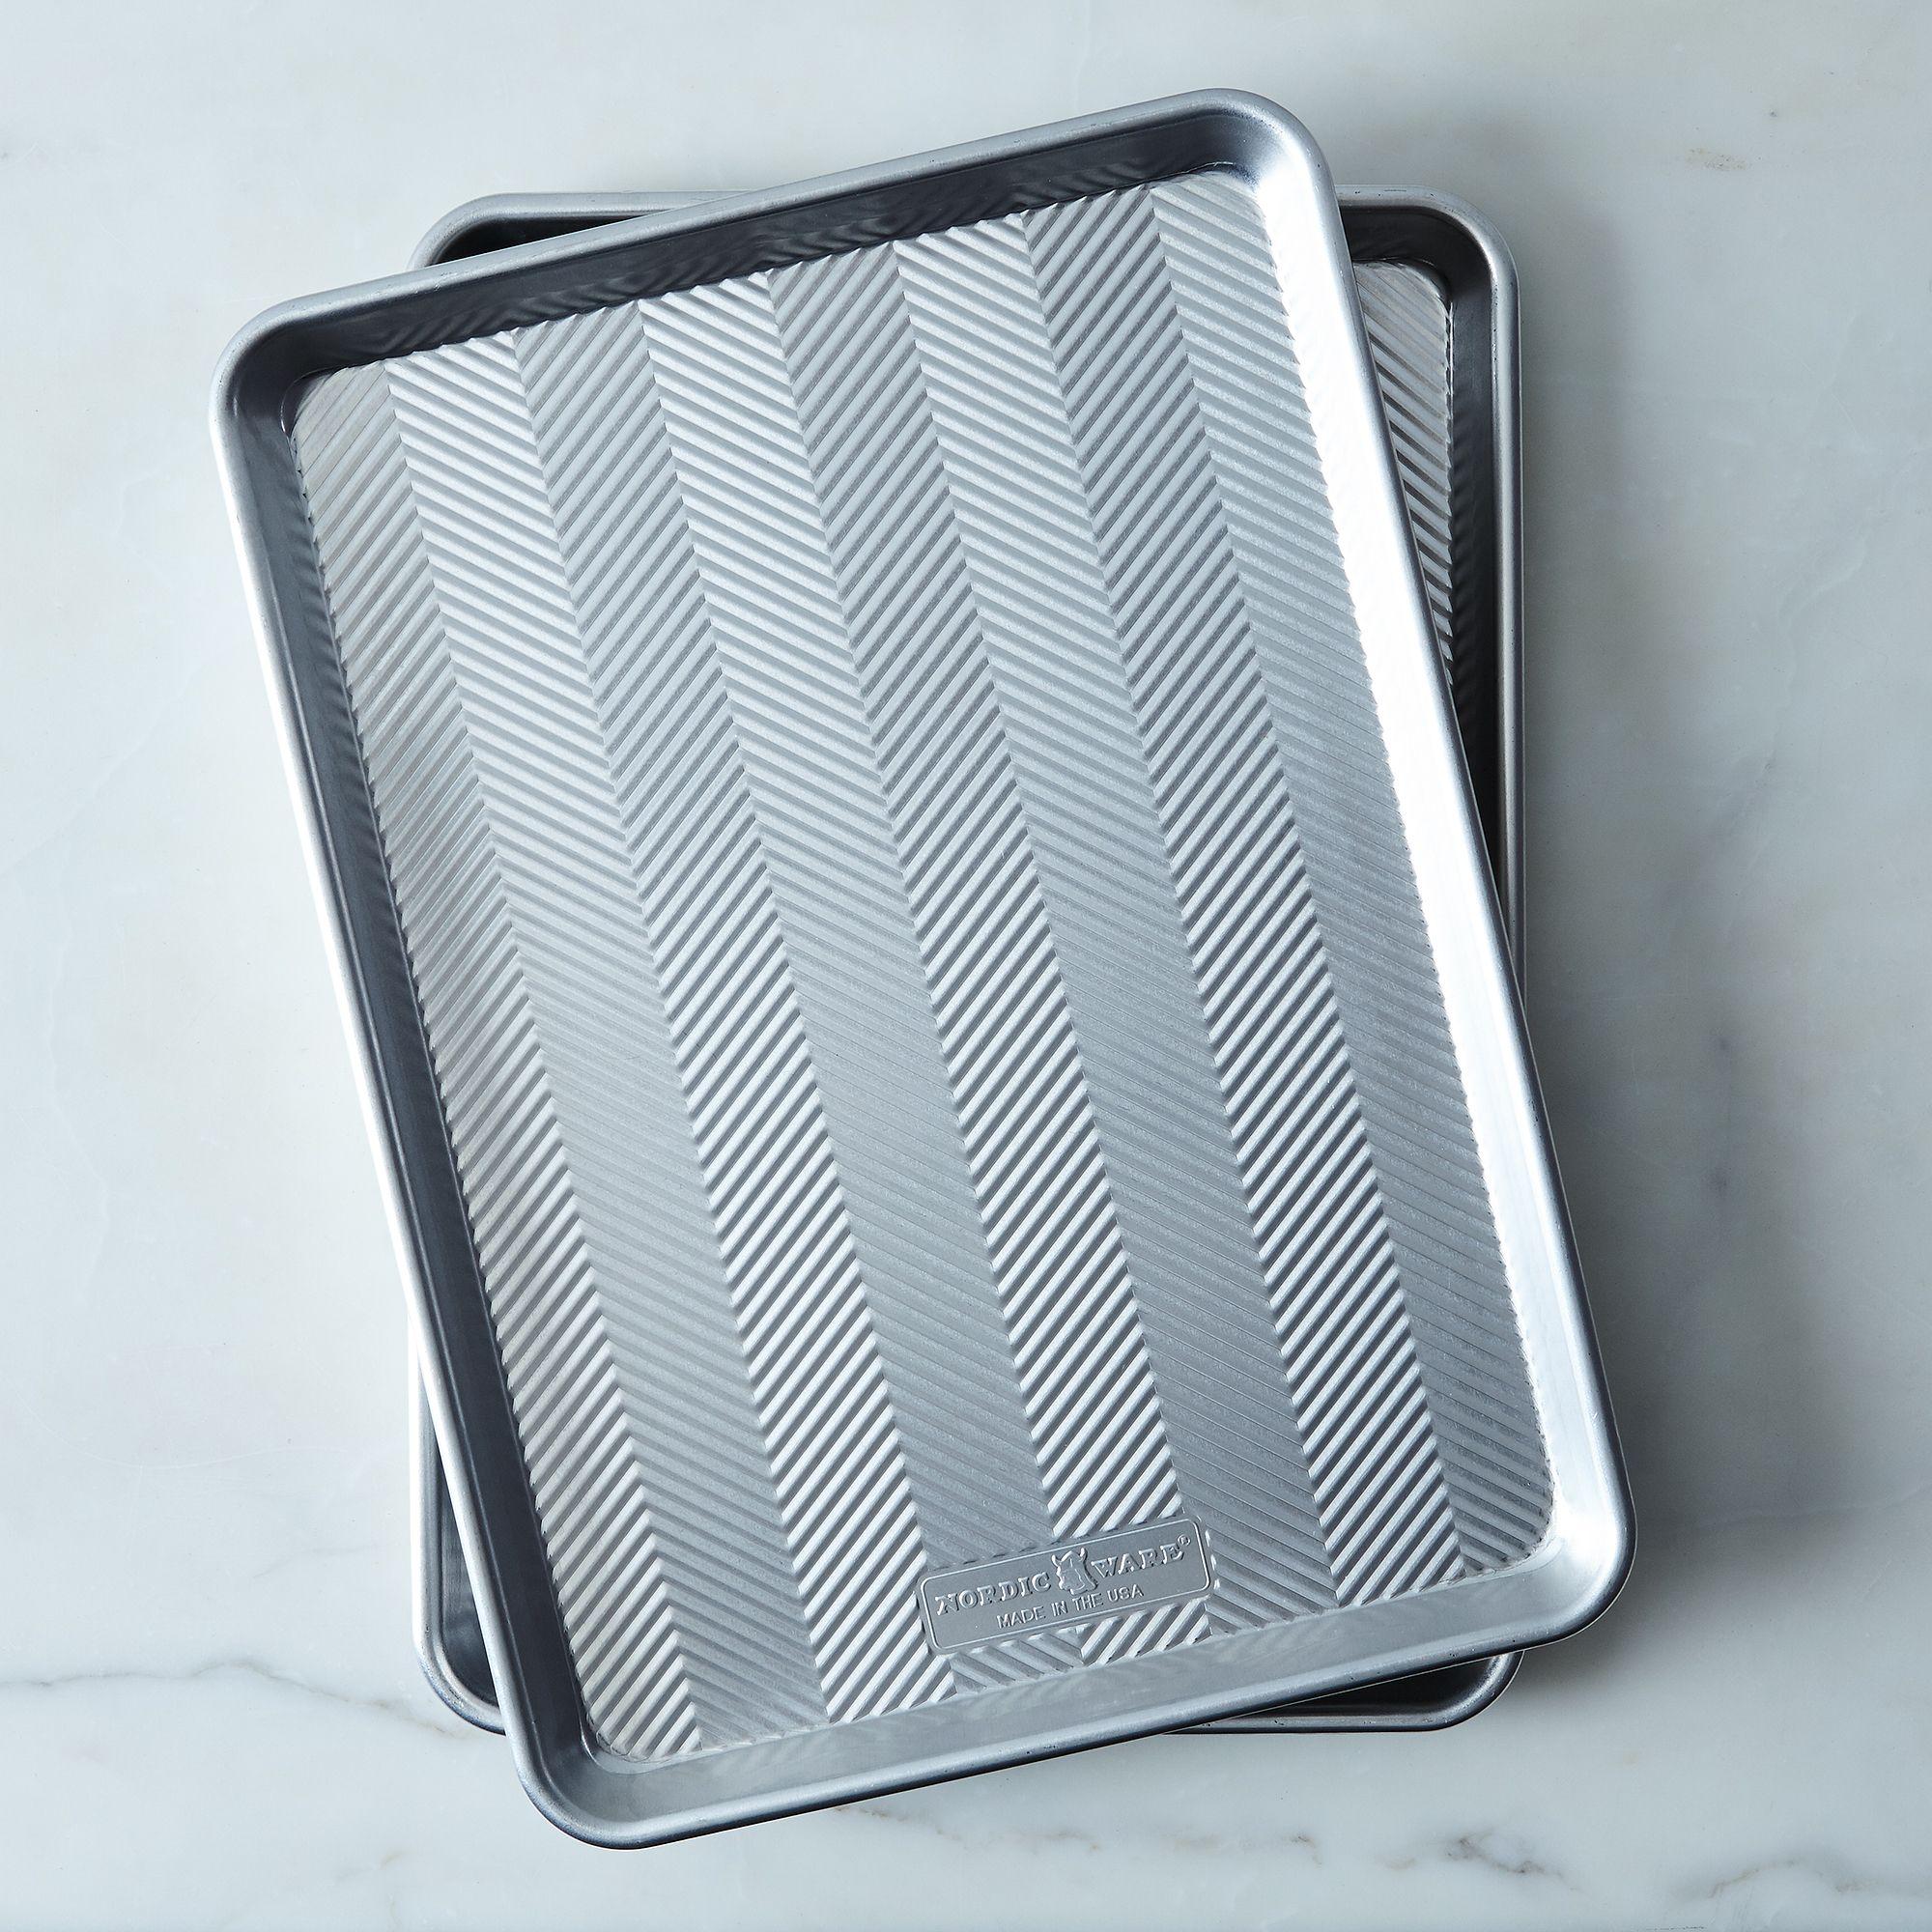 474745a3 c87f 4255 9947 60656a5d878a  2017 0203 nordic ware prism aluminum baking sheet half sheet set of 2 silo rocky luten 002